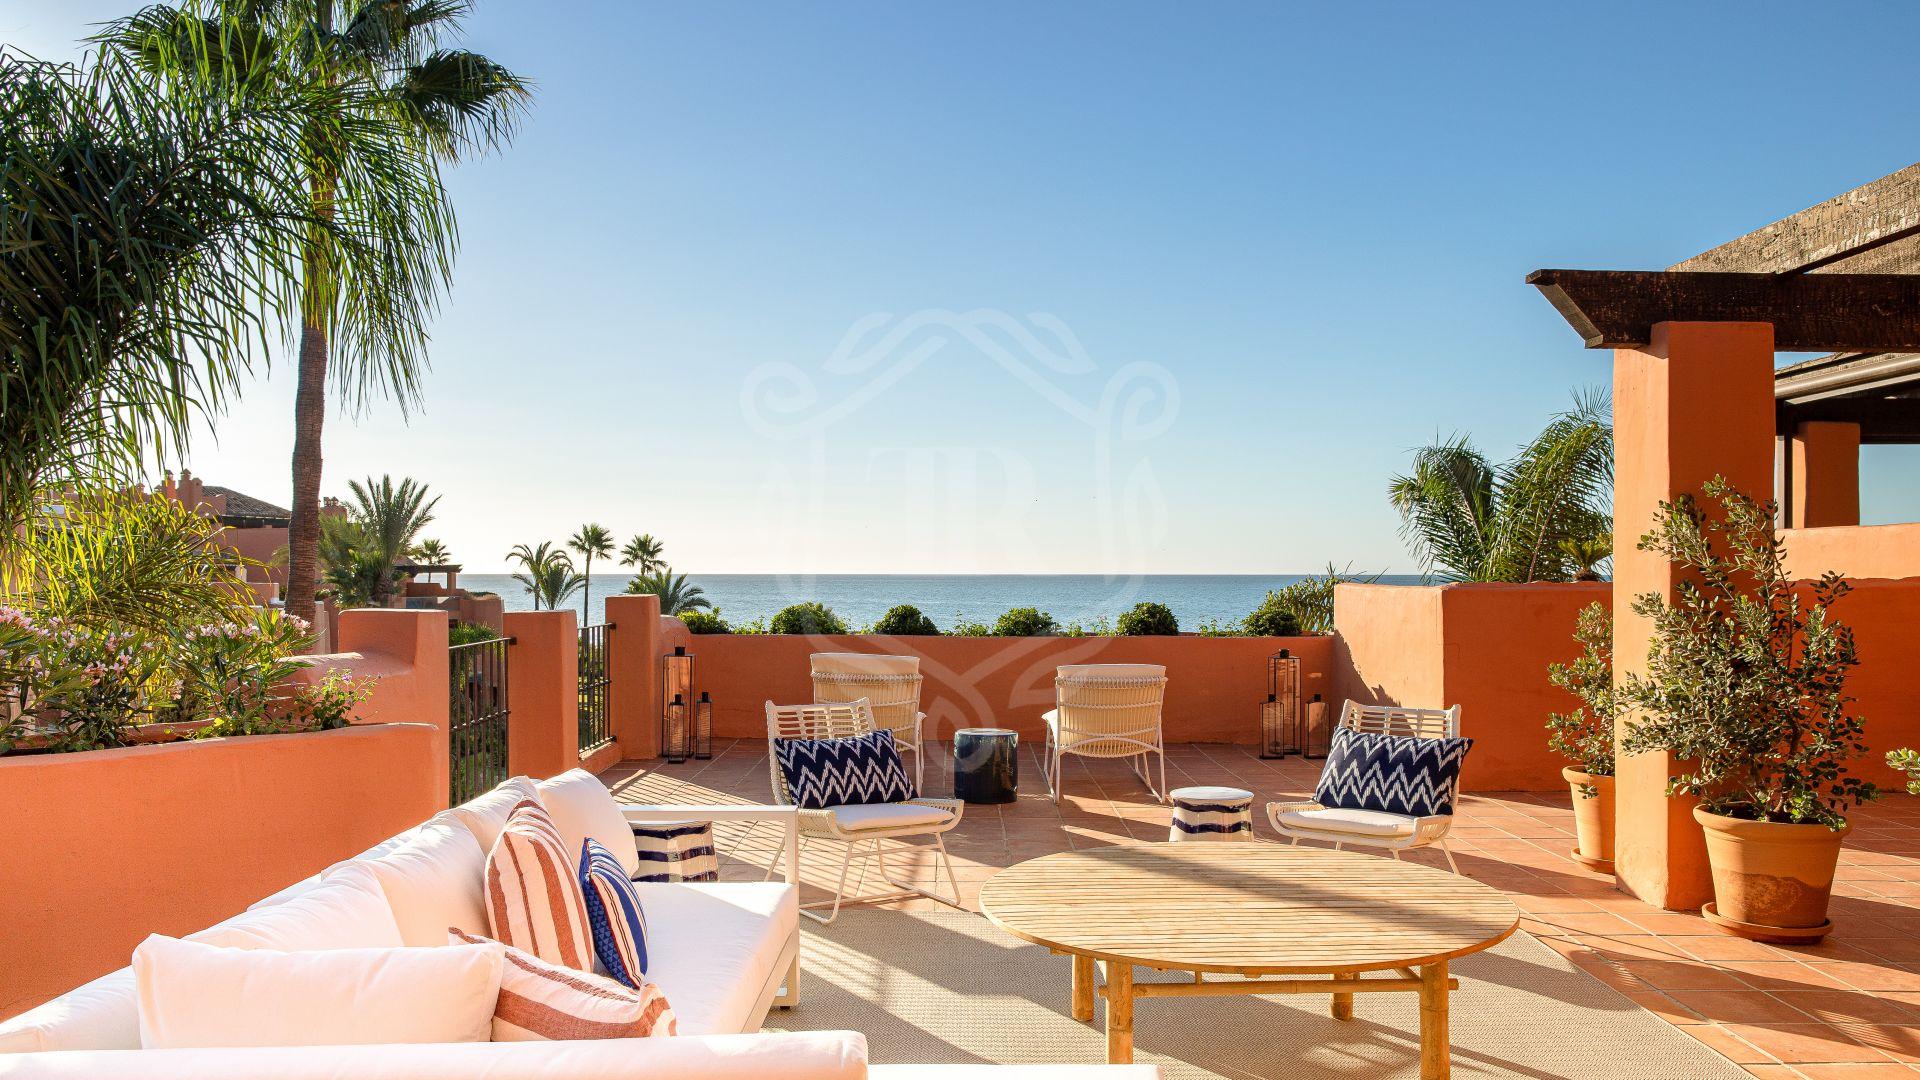 Beachfront duplex penthouse in La Morera, Marbella East